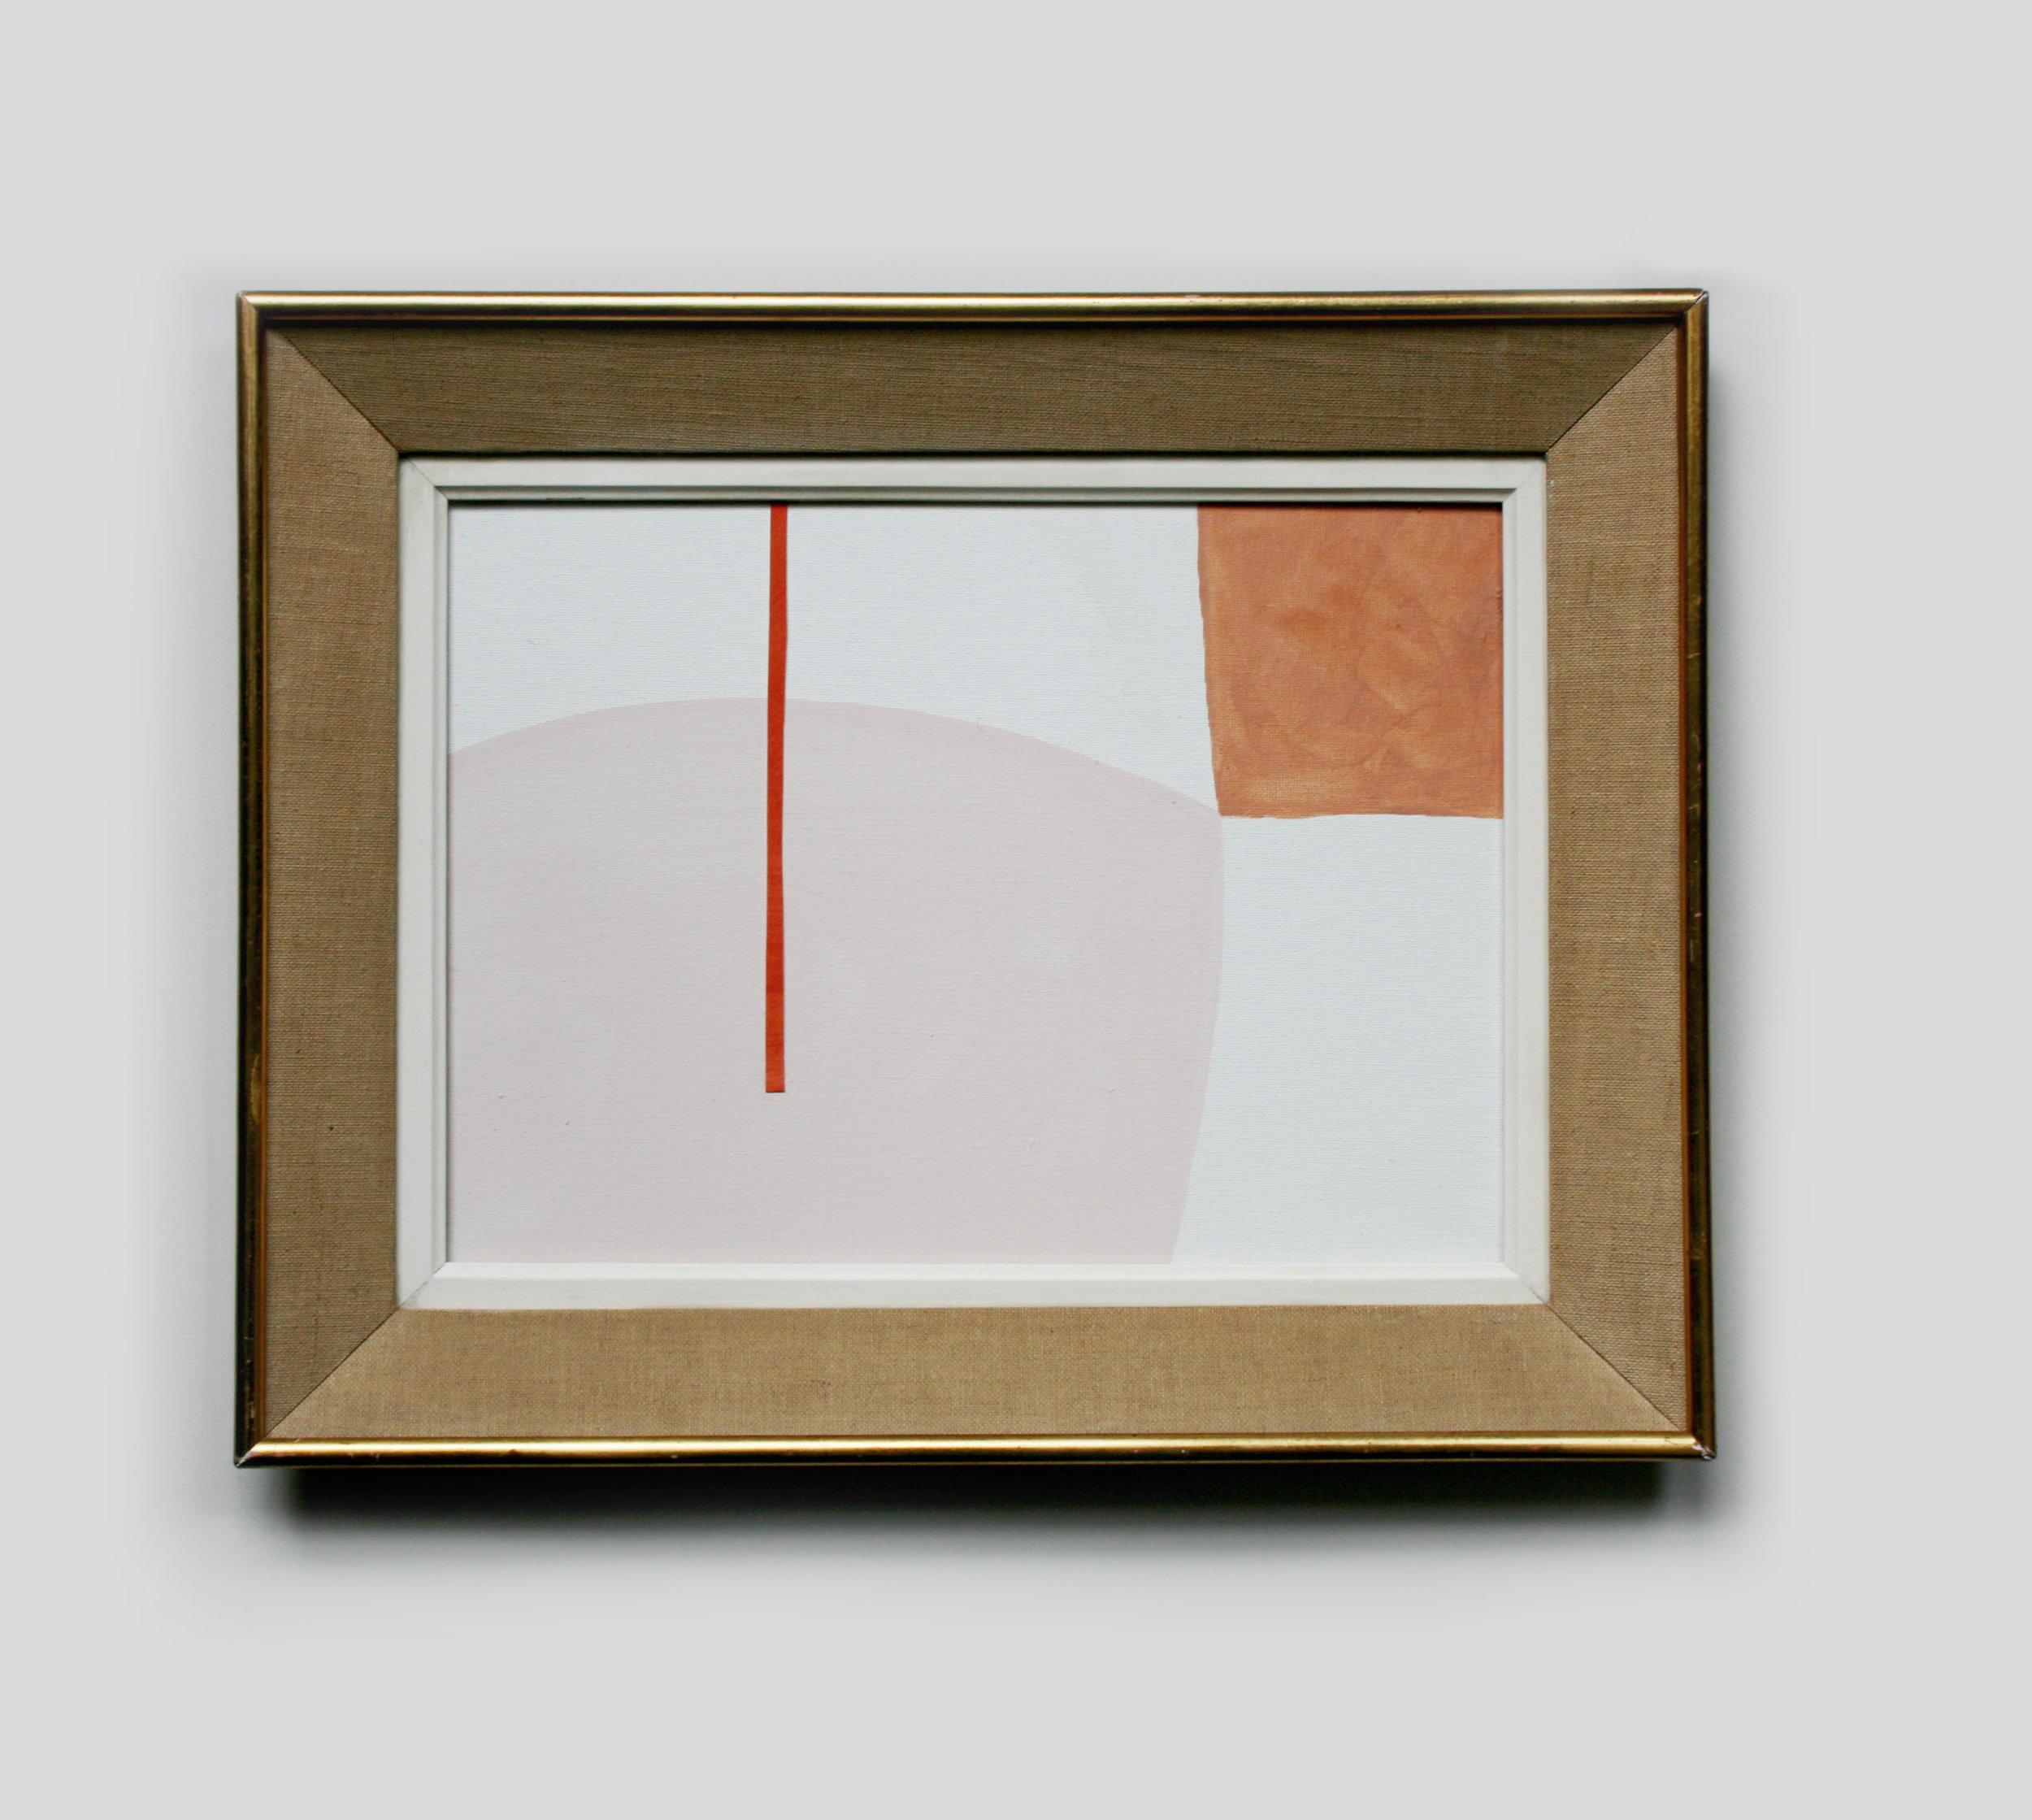 Untitled 17-01